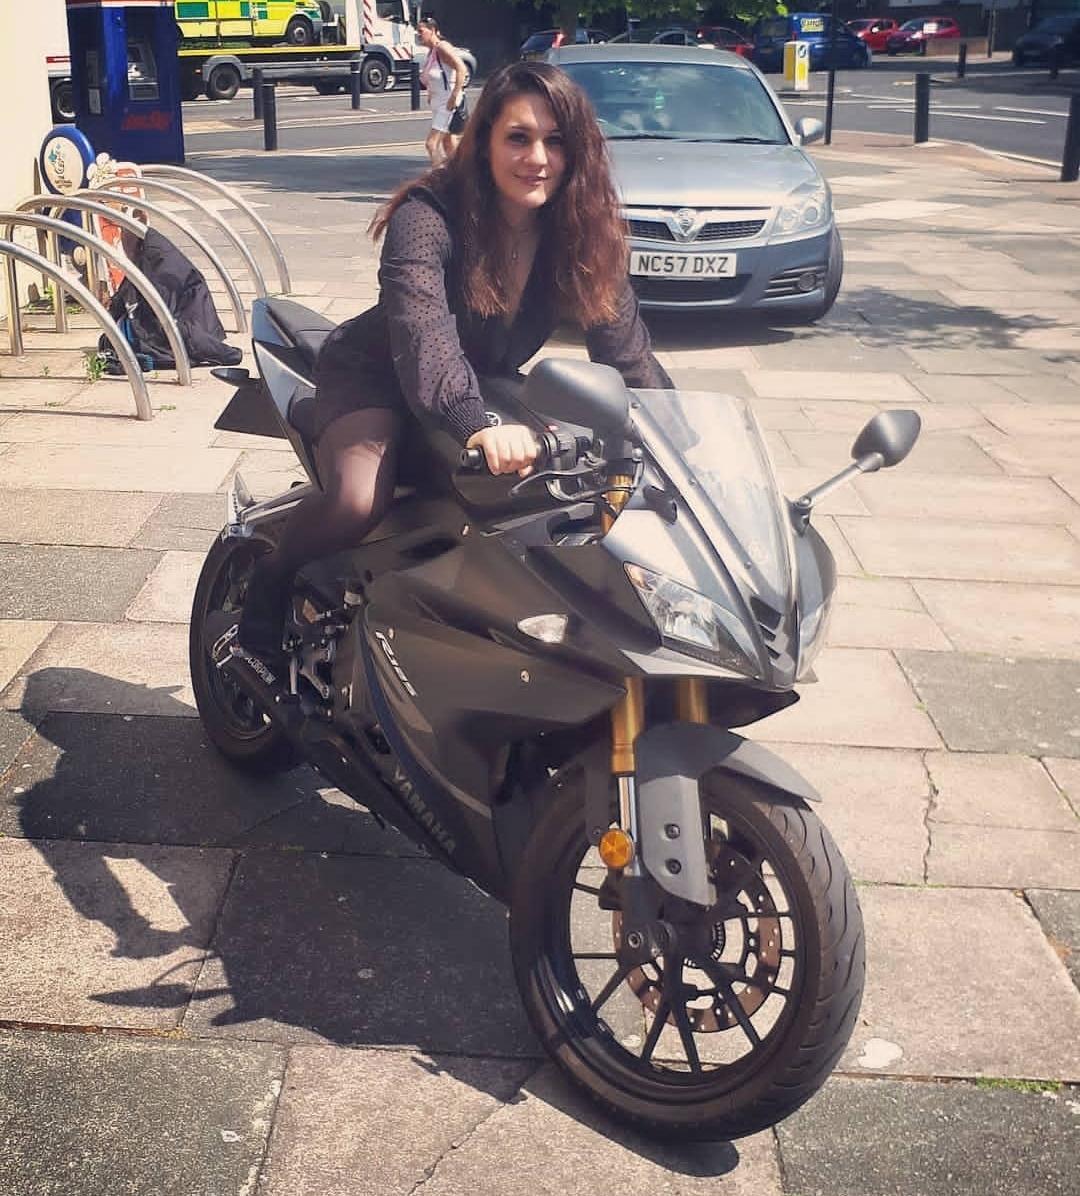 Courtney Yamaha rider